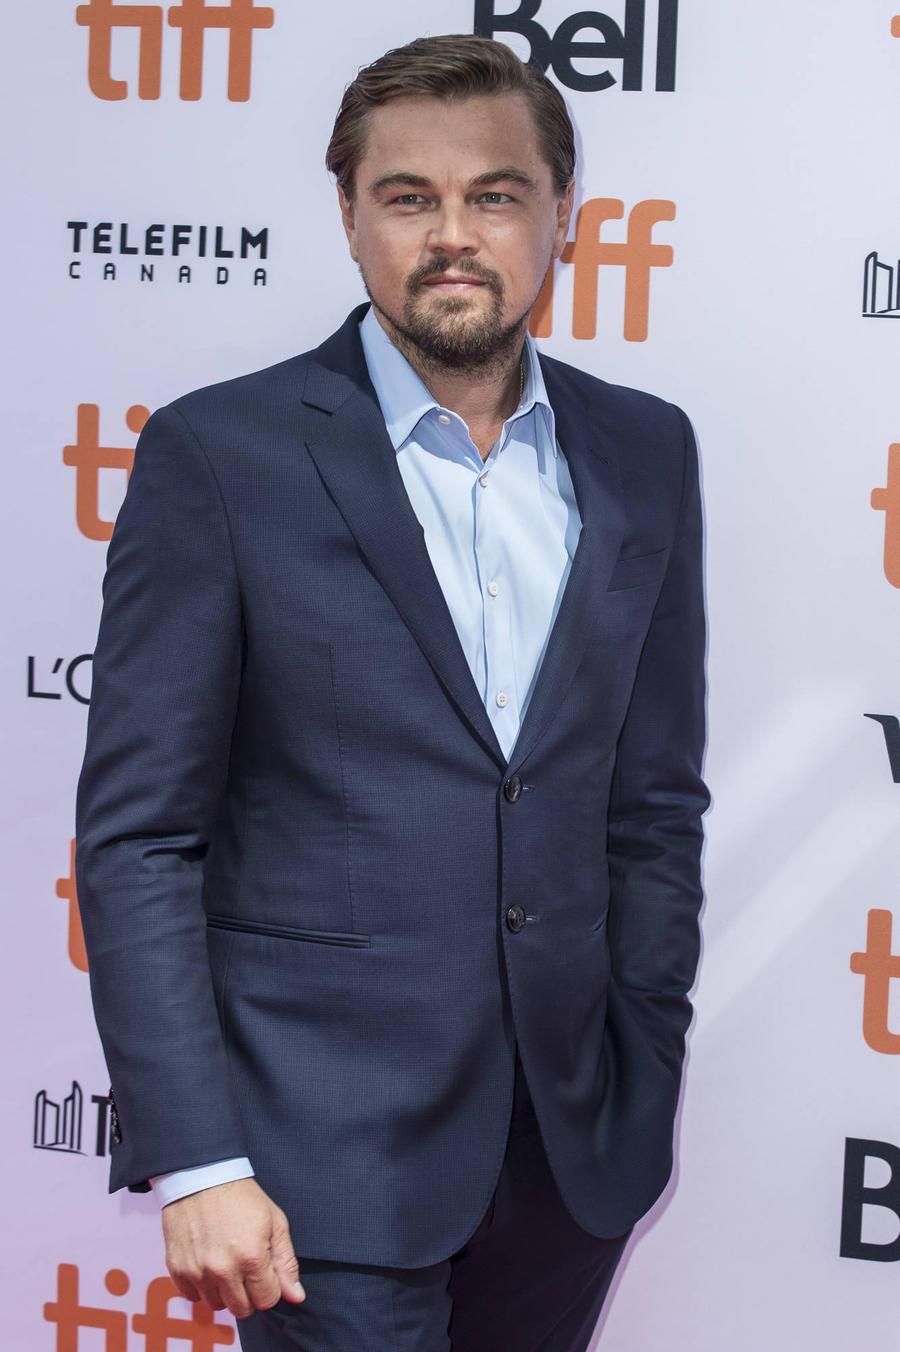 Leonardo Dicaprio Selling Off Bachelor Pad